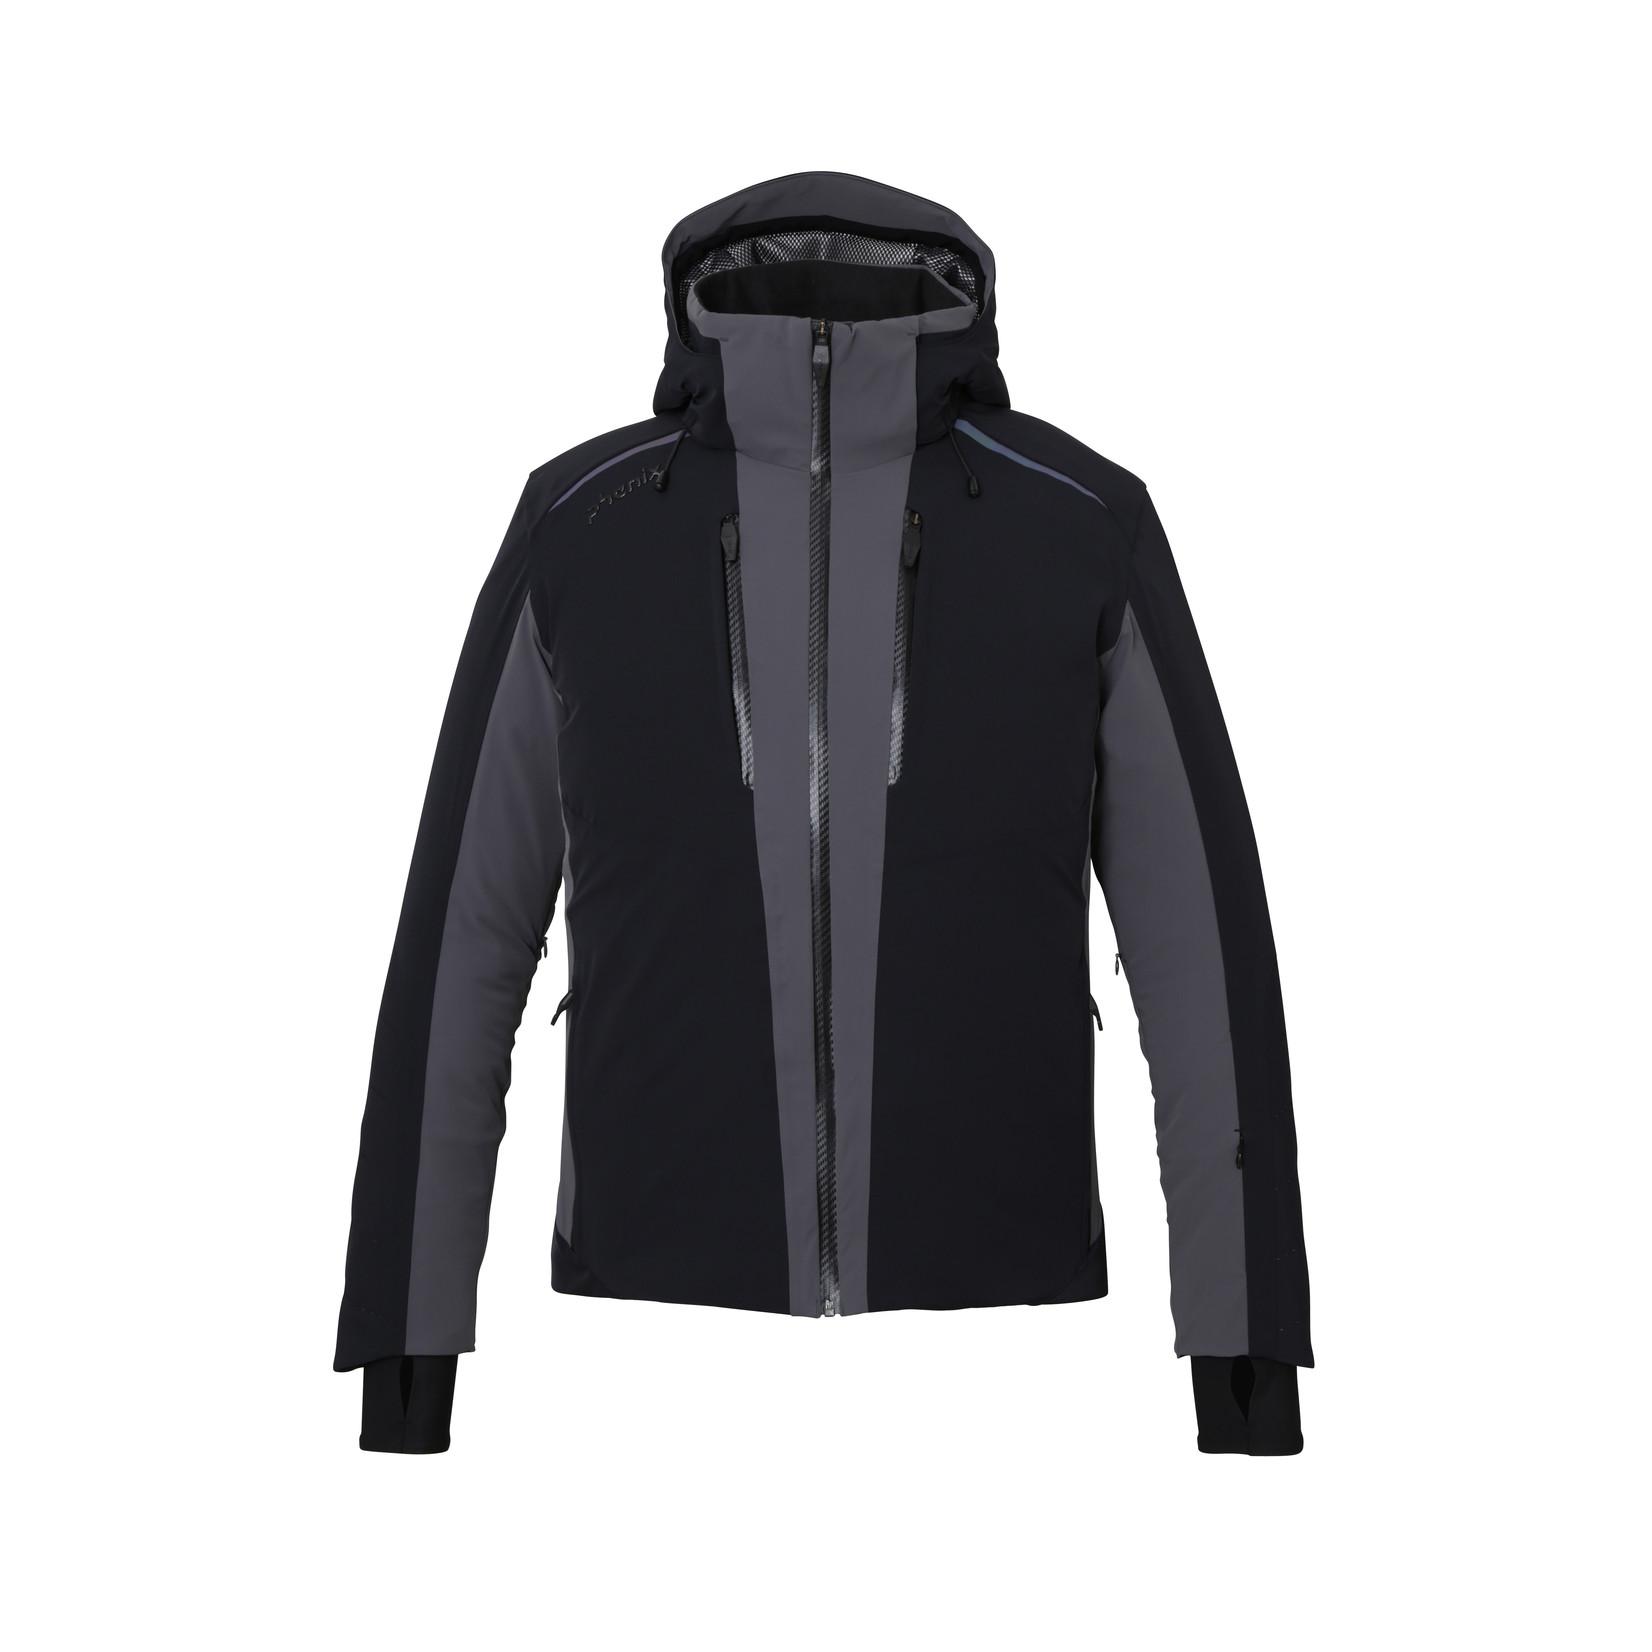 PHENIX Wing Jacket black